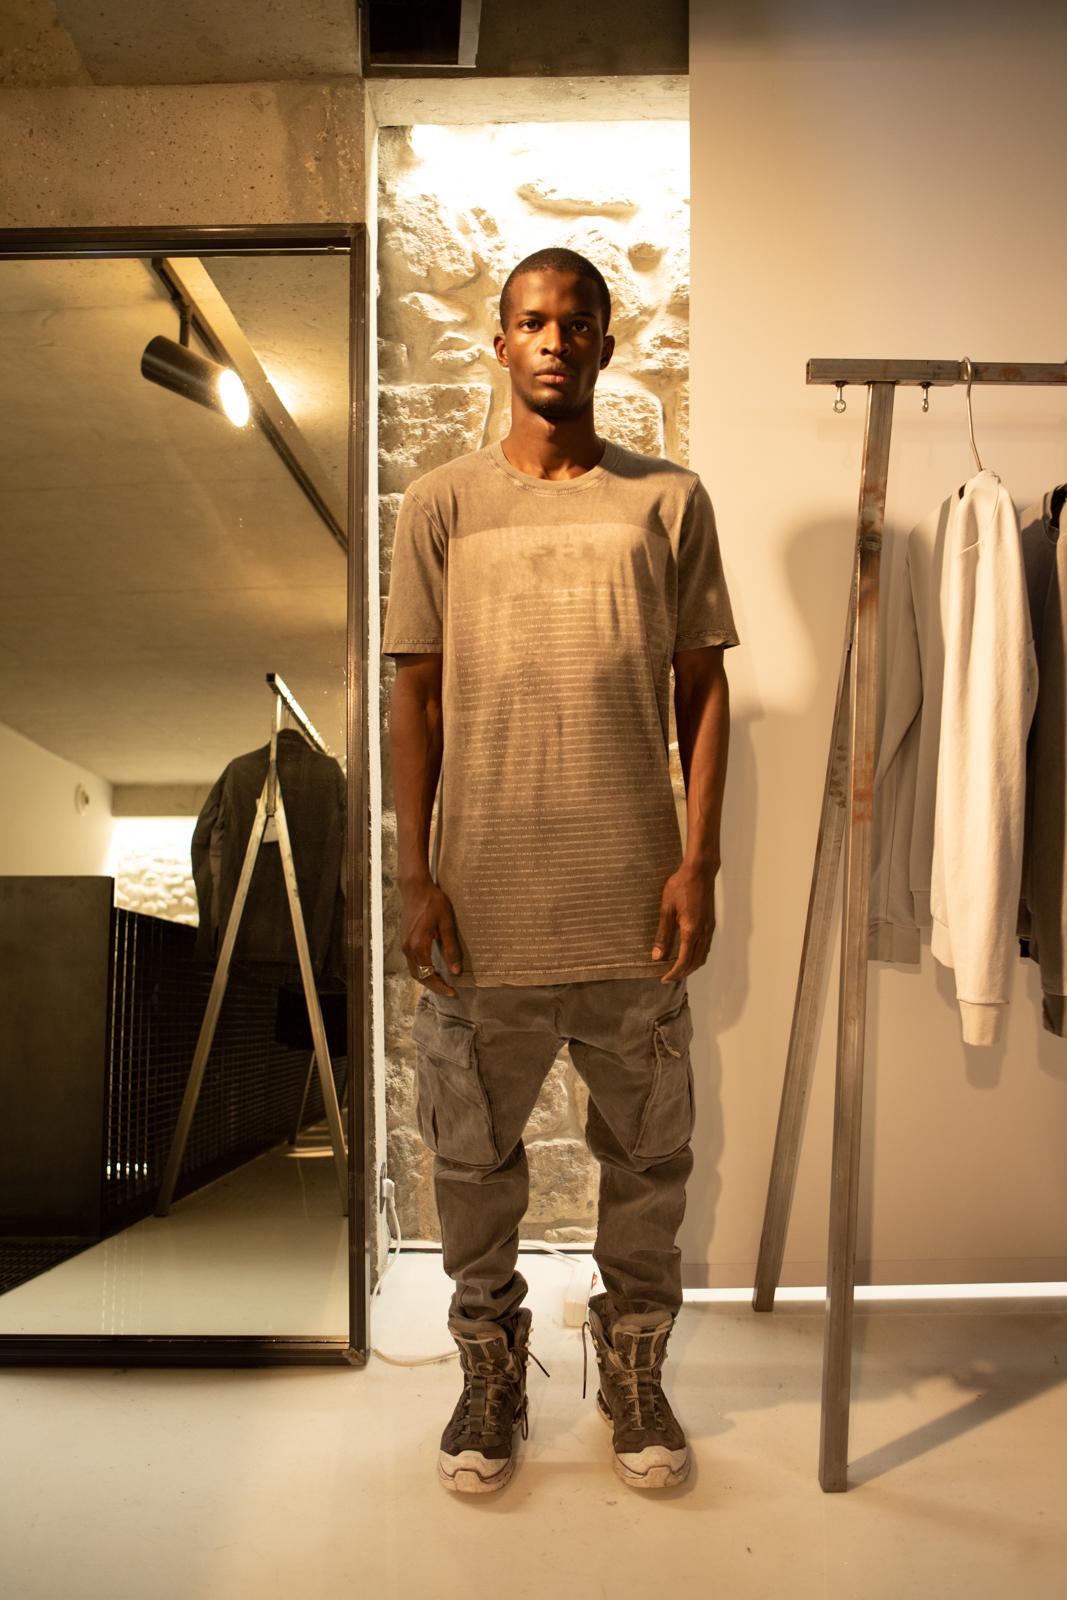 11 By Boris Bidjan Saberi Tie Dye Print T-Shirt Cargo Pants Hiker Boots in Grey FW20